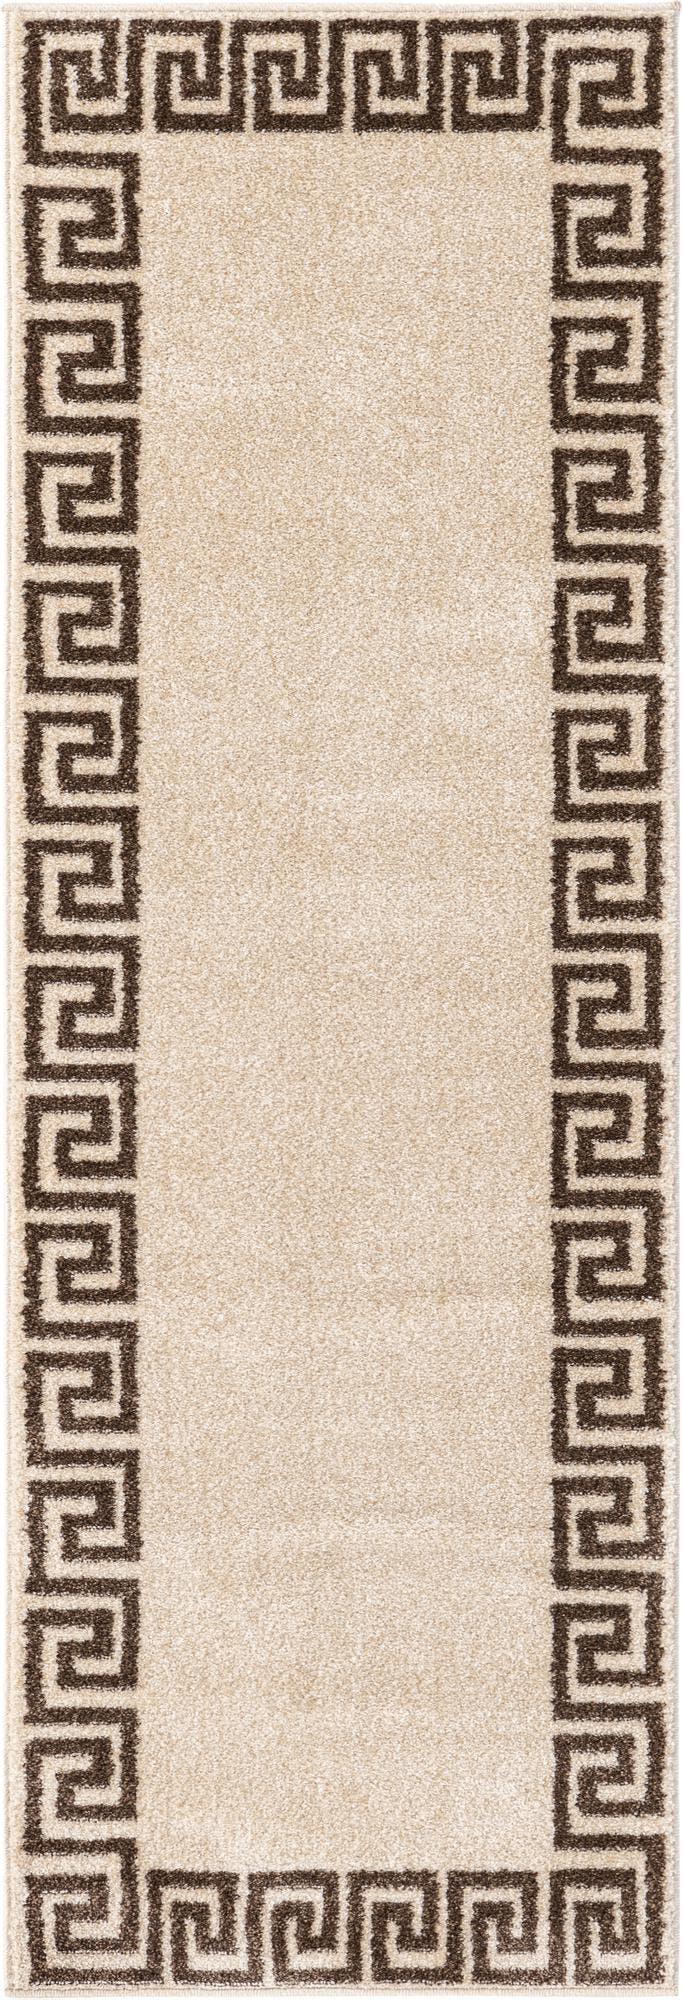 2' x 6' Greek Key Runner Rug main image